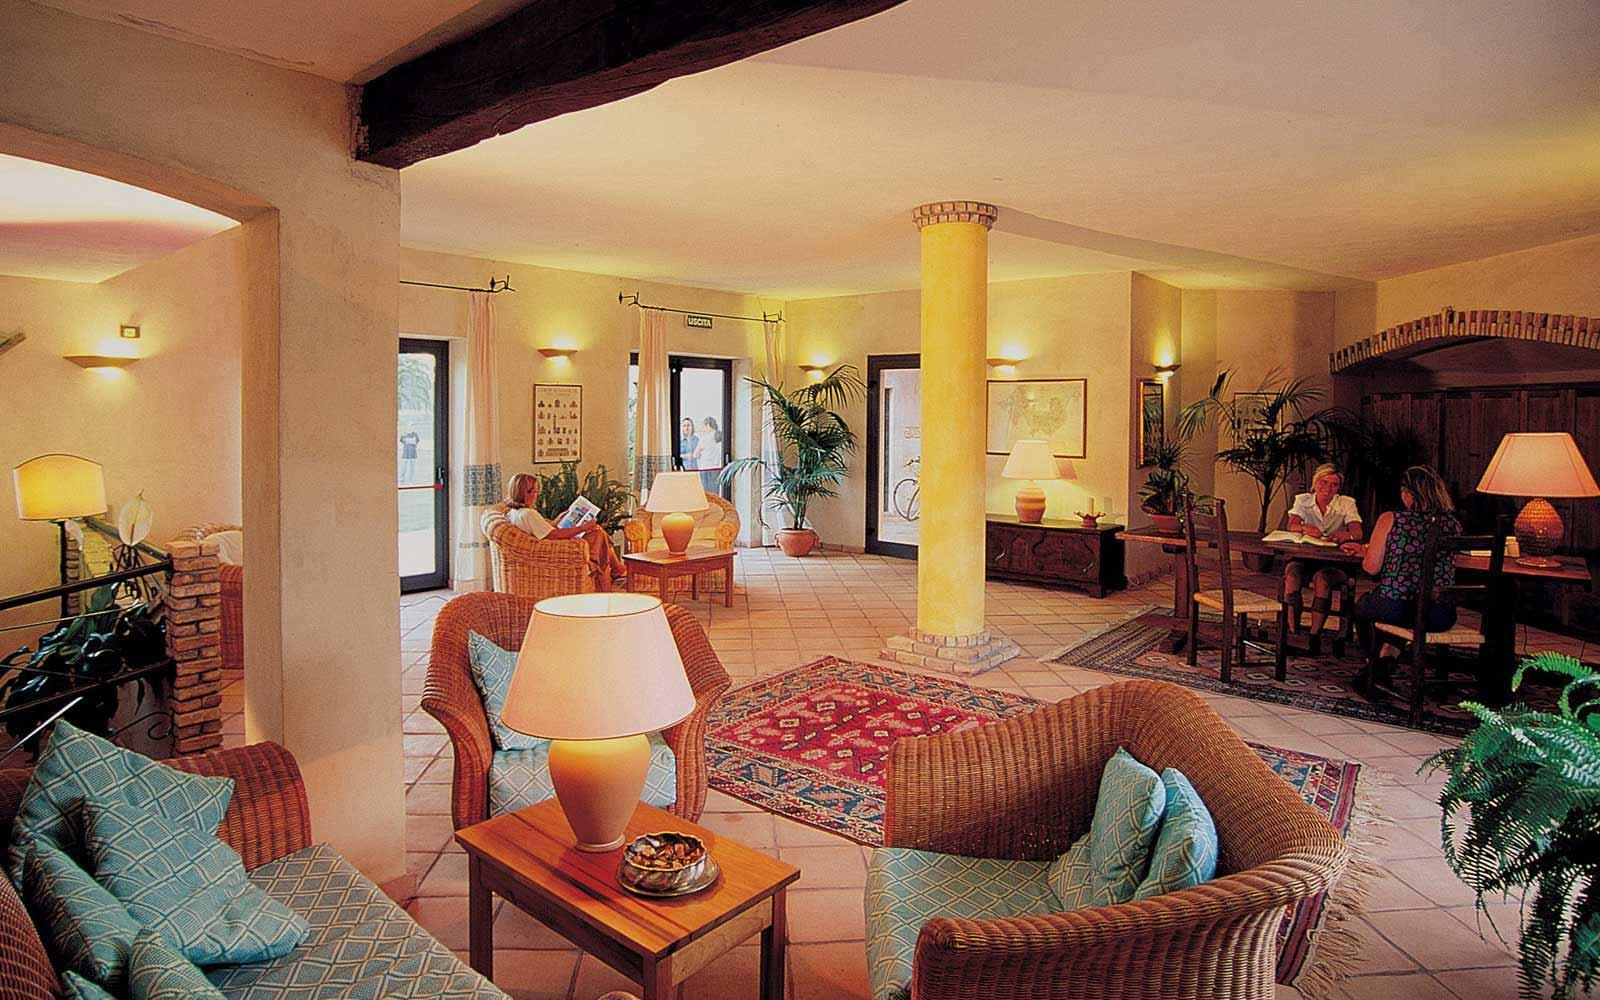 Reception at Residence Baia delle Palme